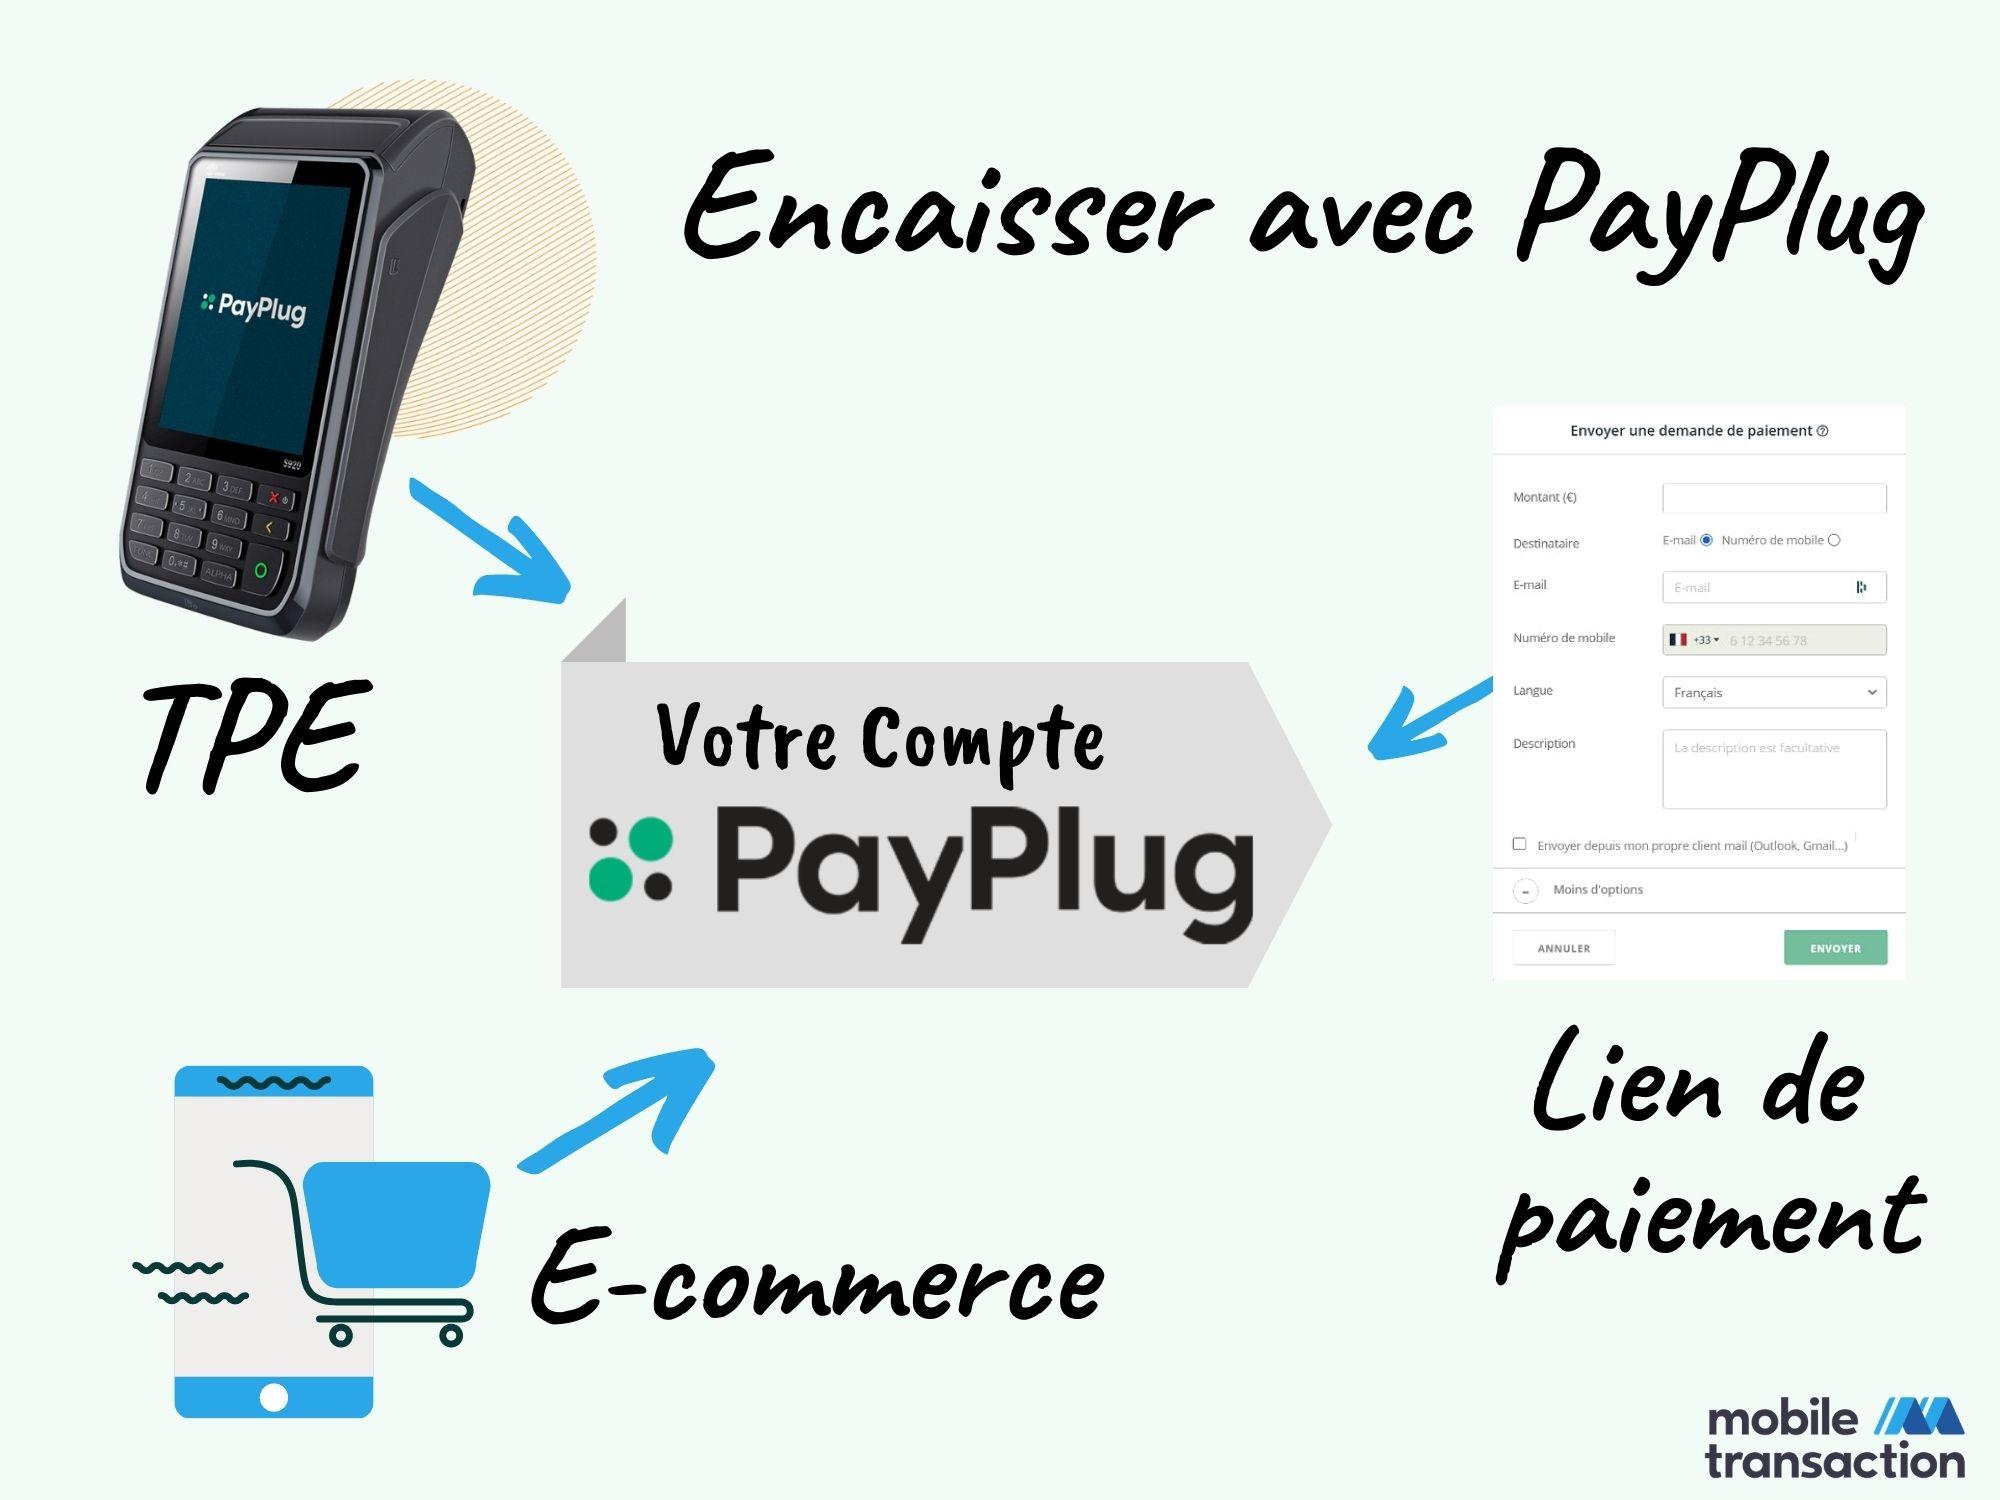 Encaisser avec PayPlug